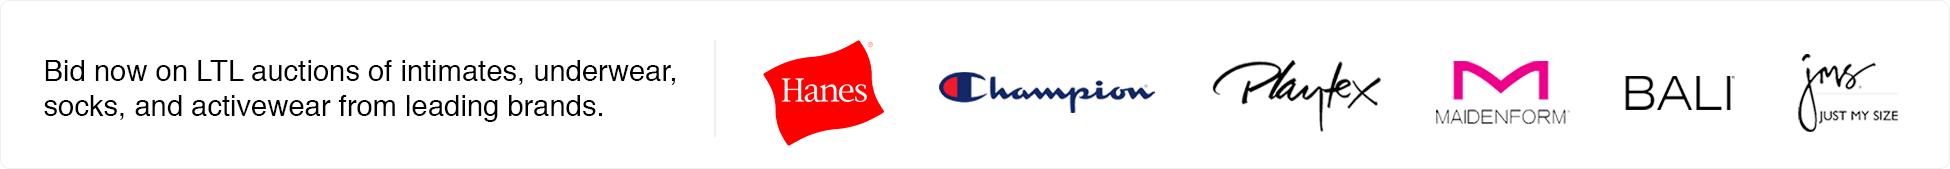 Hanes Liquidation Auctions Marketplace Launch